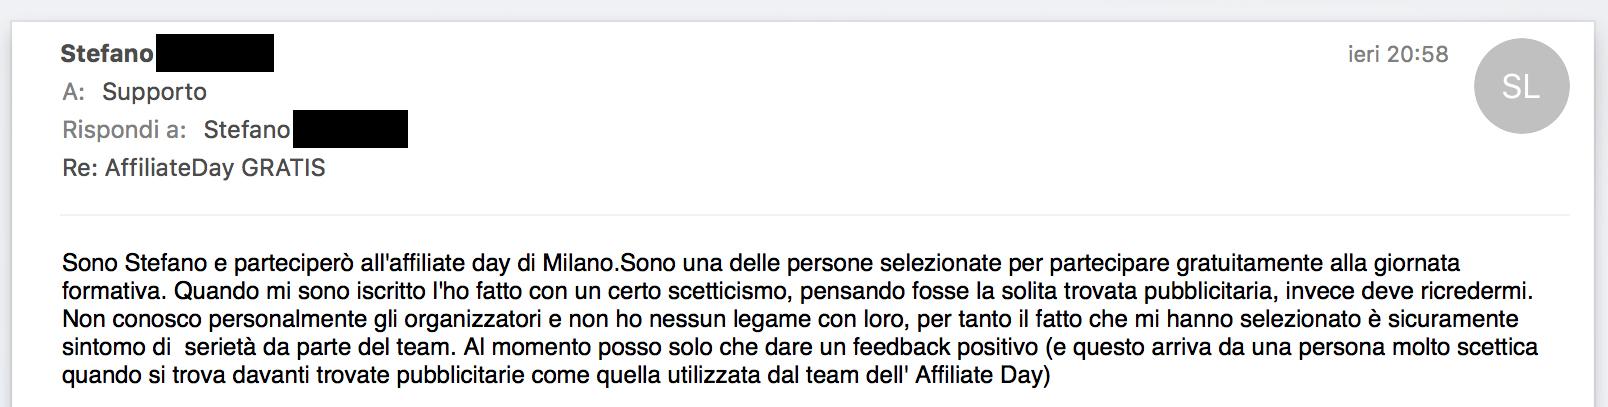 Feedback Stefano